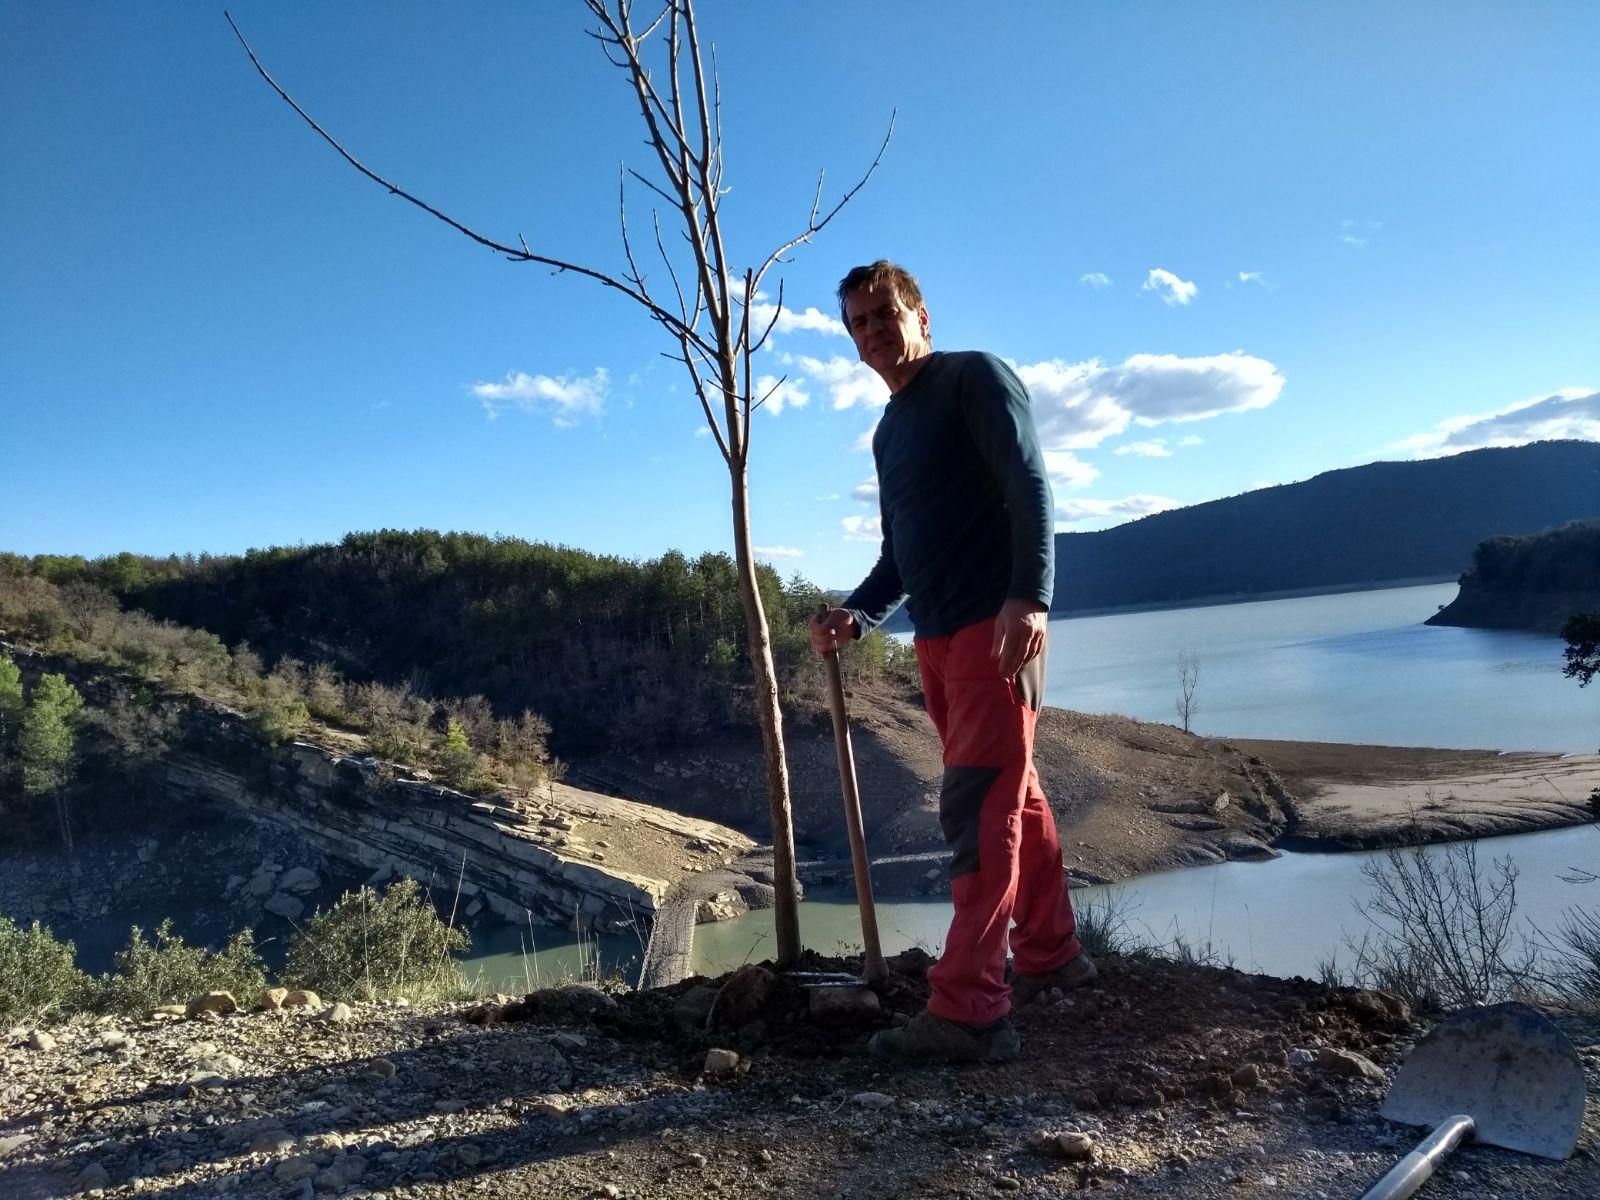 Respetando la naturaleza